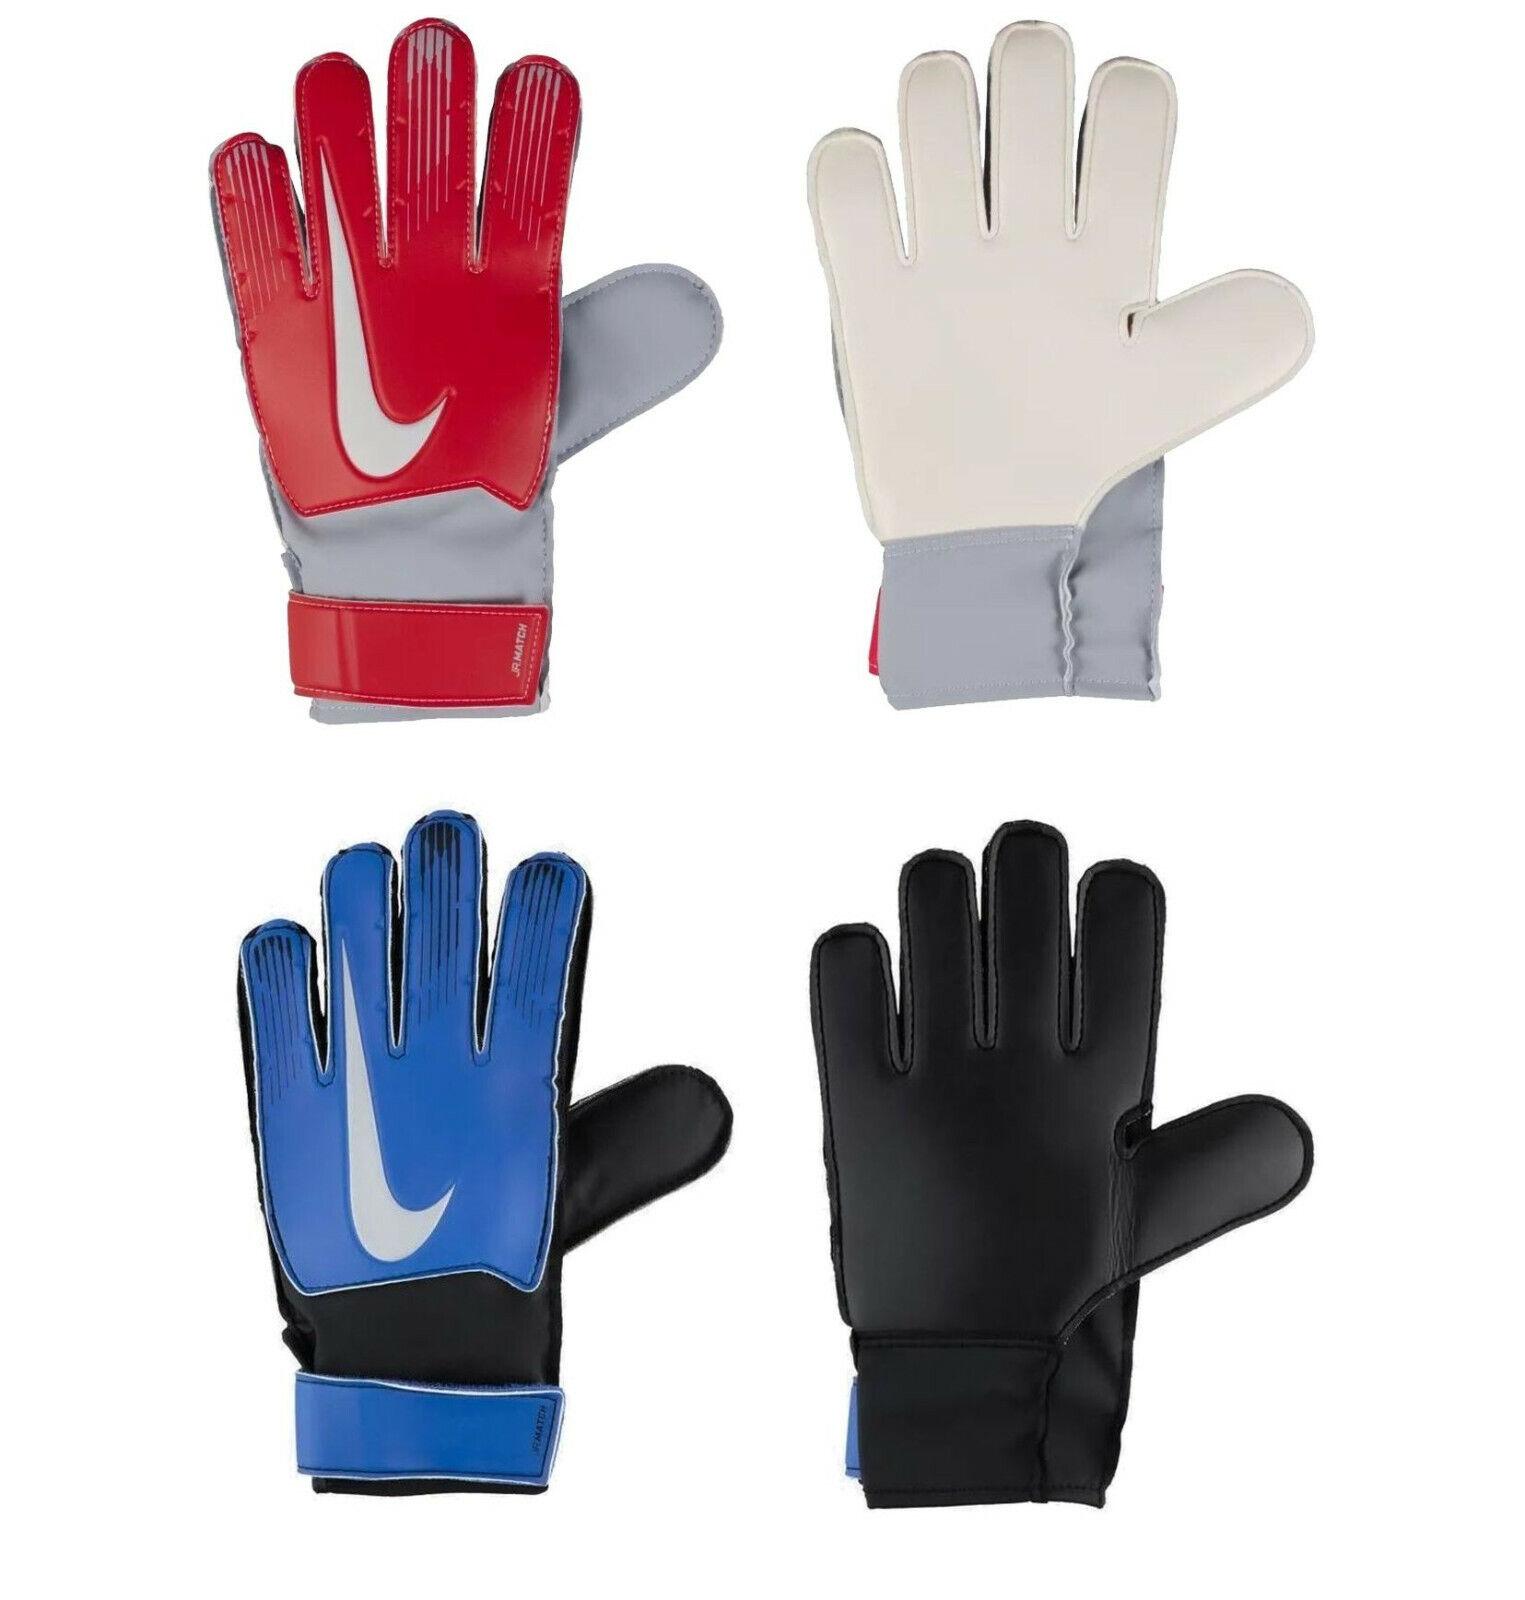 Nike Kinder Fußball Torwarthandschuhe Junior Match TW Handschuhe